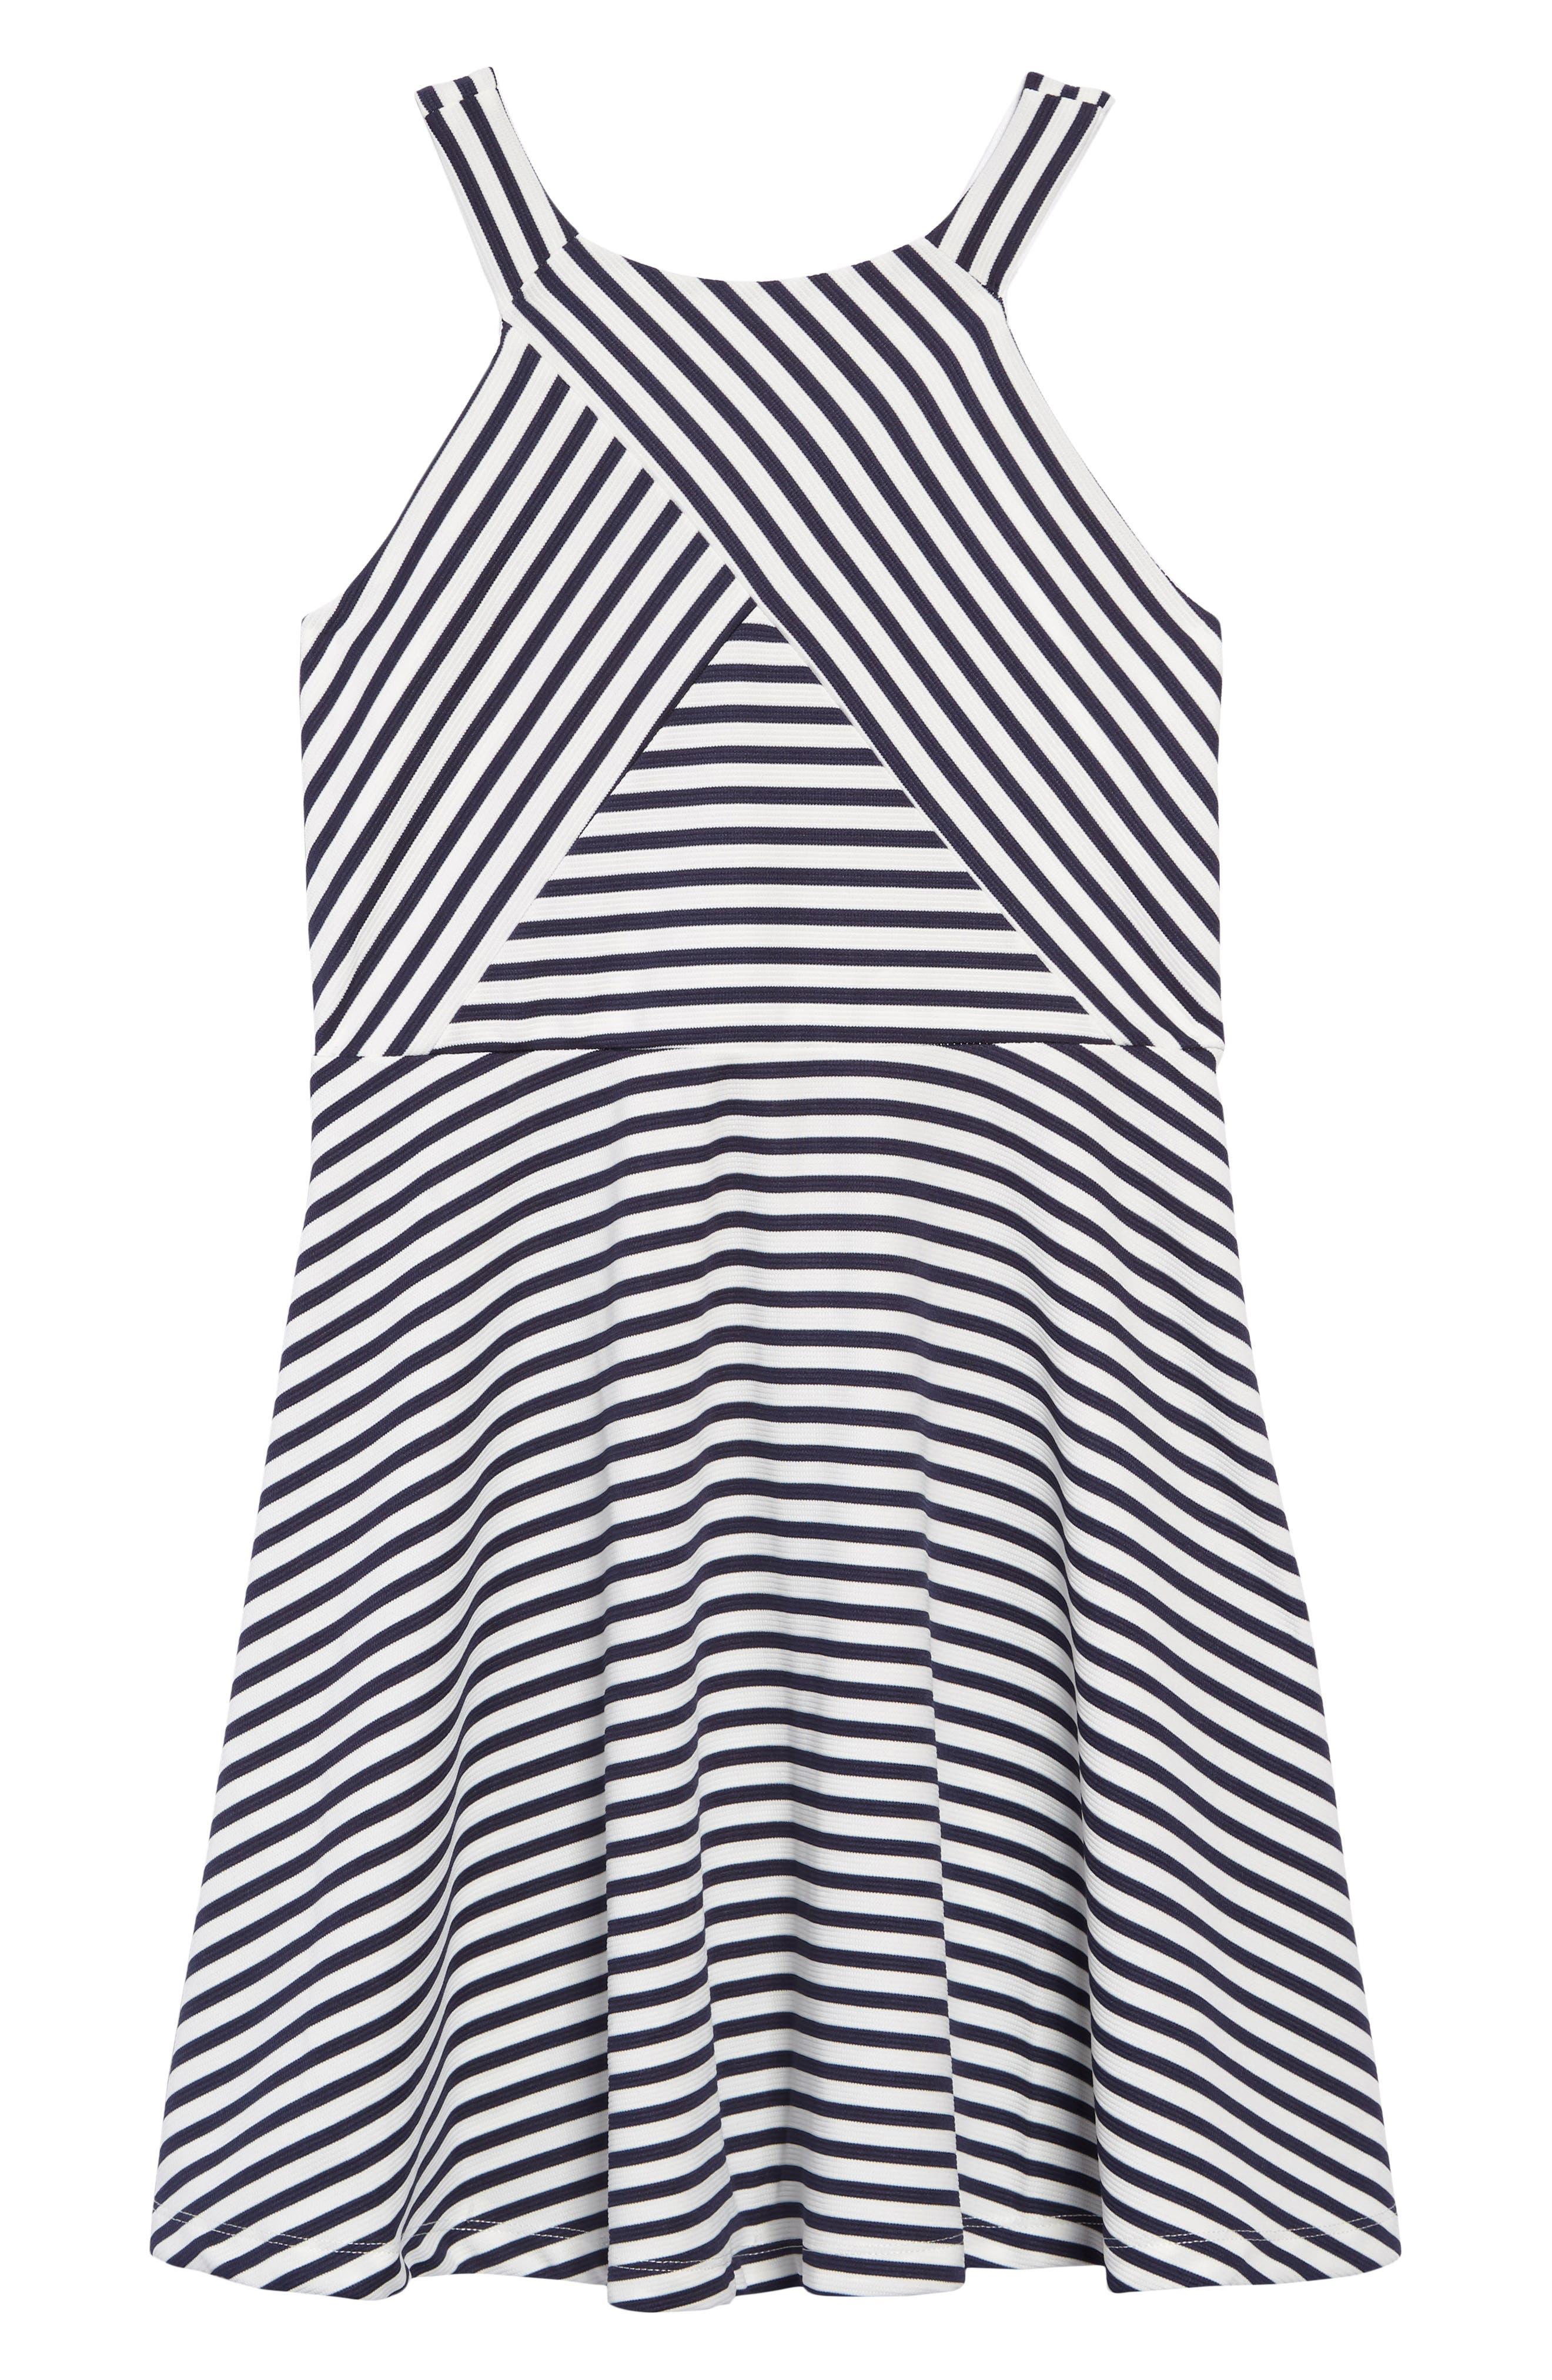 ZUNIE, Stripe Ottoman Skater Dress, Main thumbnail 1, color, NAVY/ WHITE